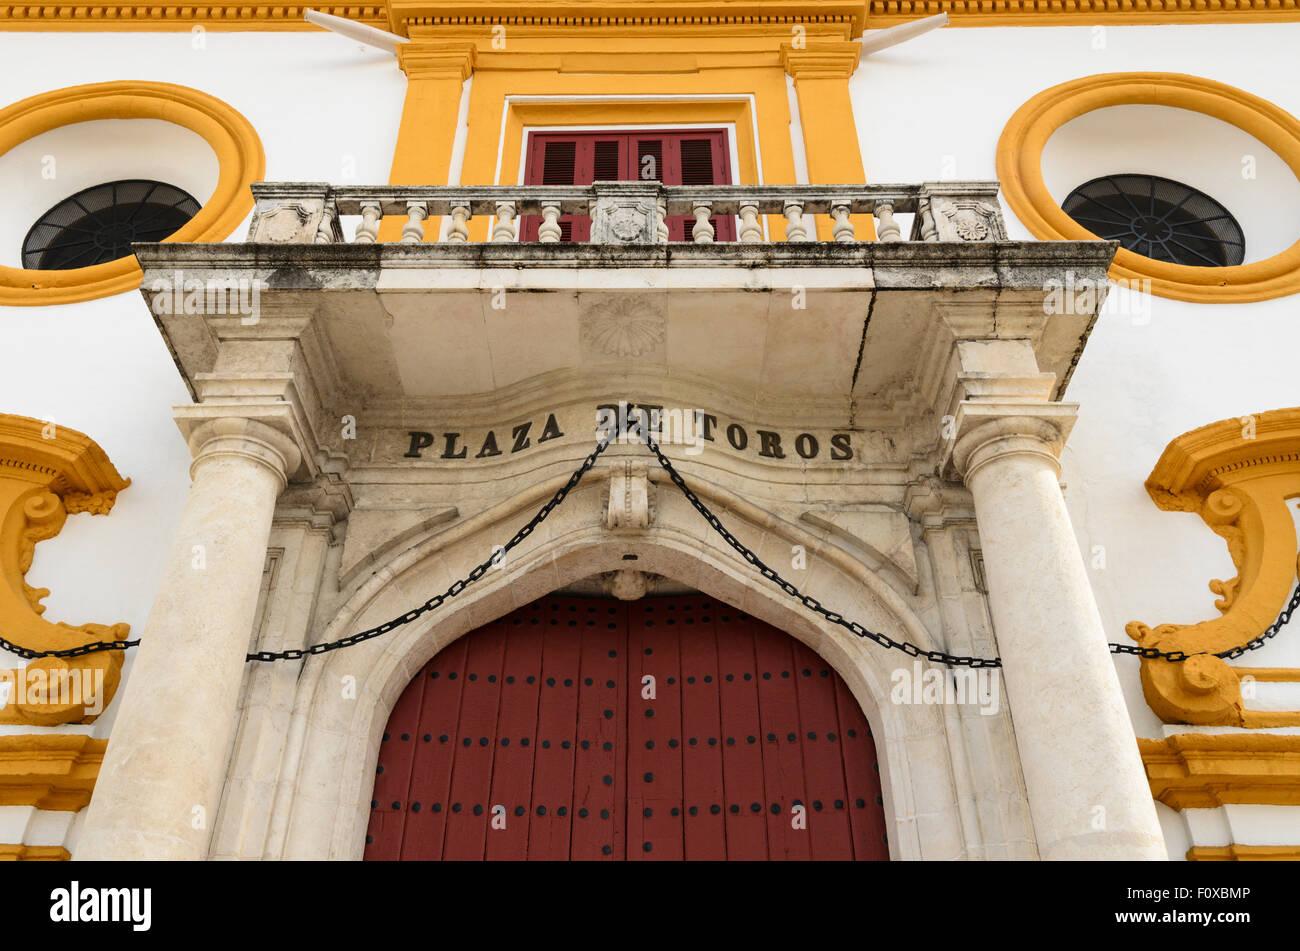 Detail of the outside of Seville Bullring, Seville, Andalucia, Spain, Europe. Stock Photo